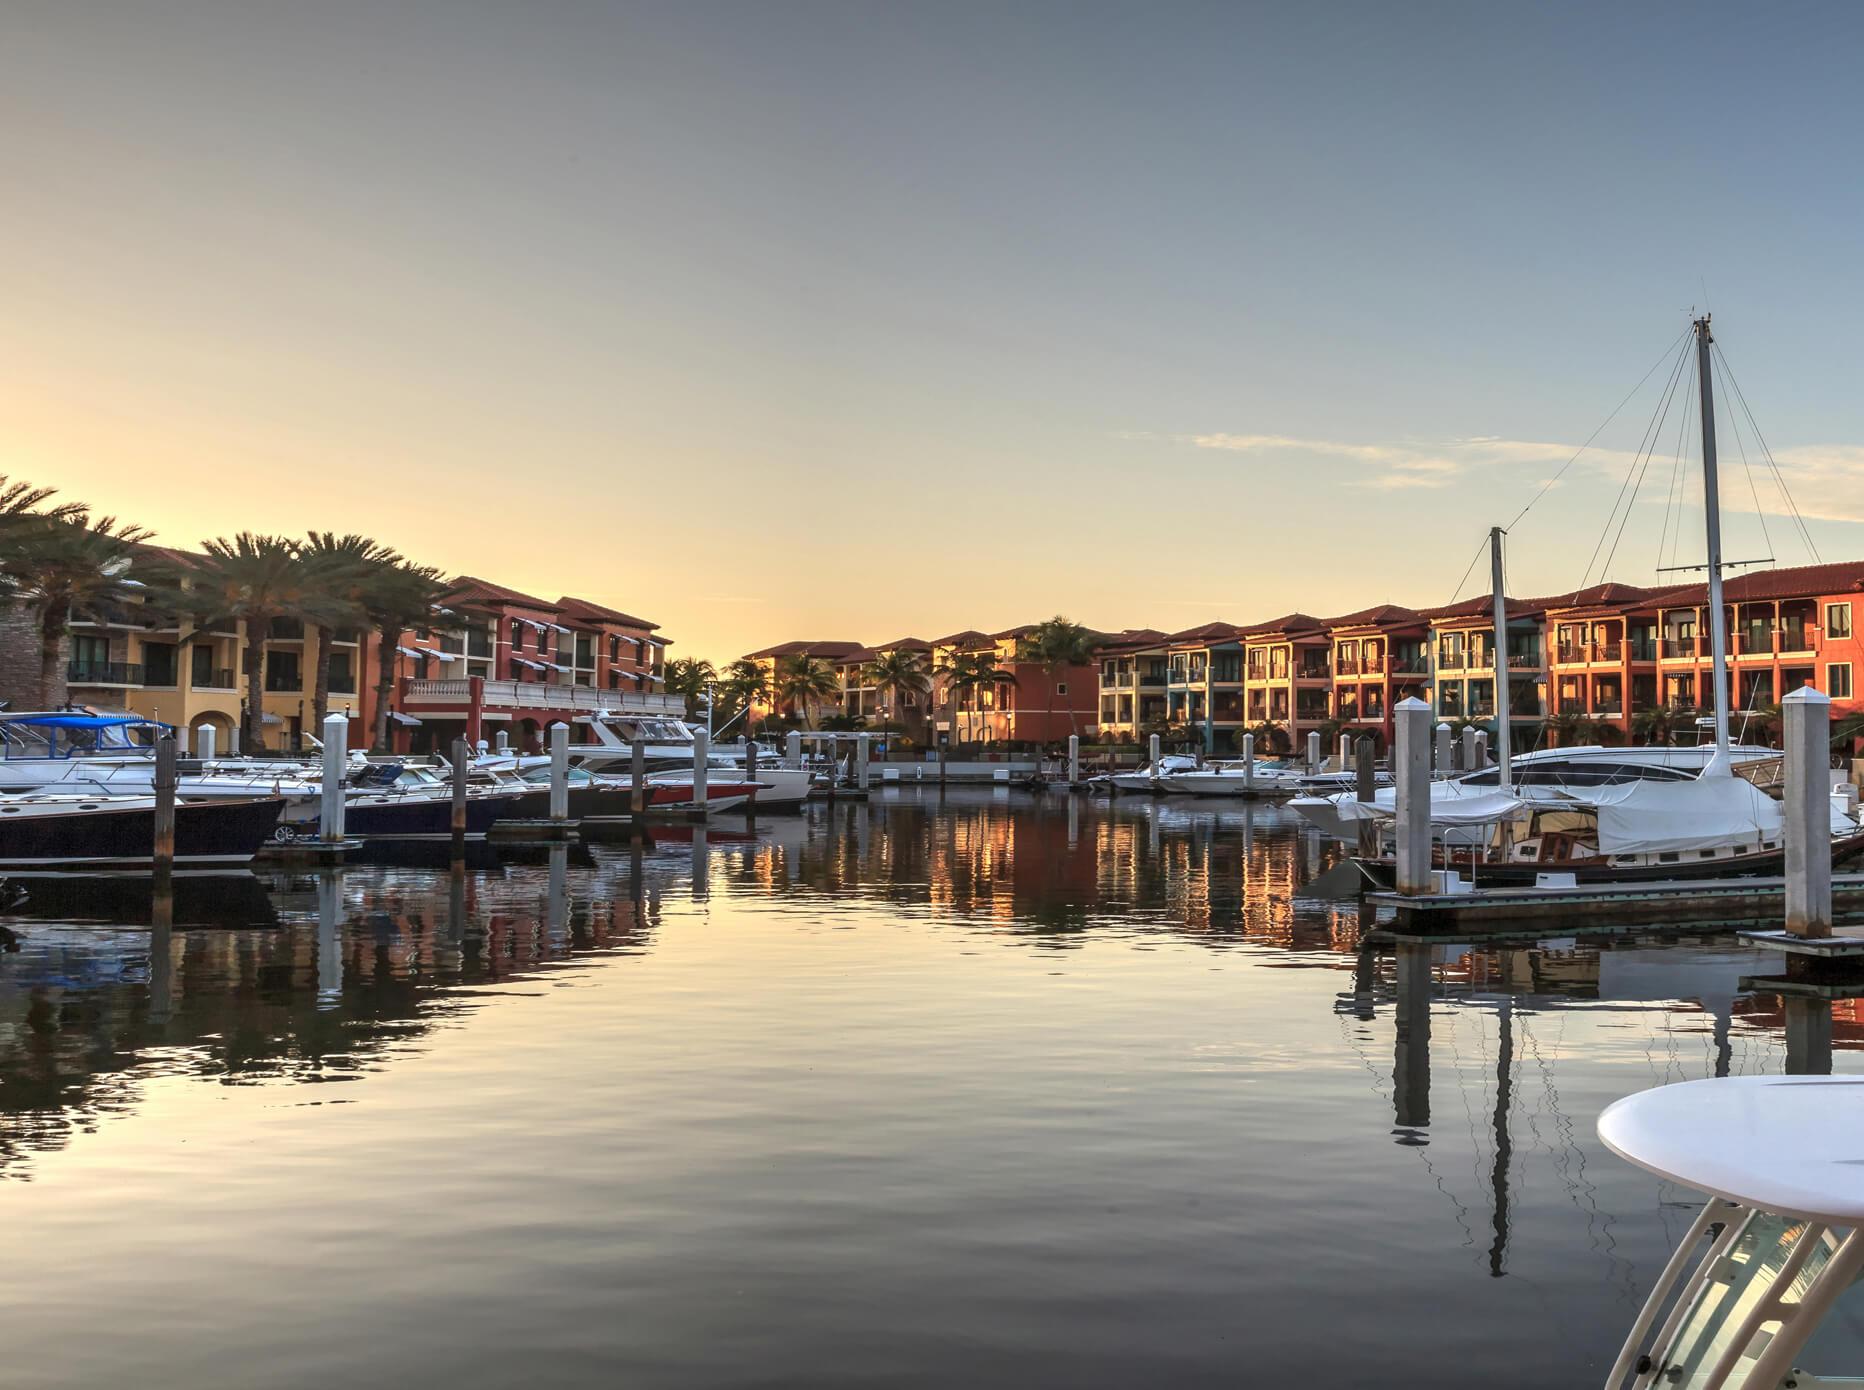 Sonja Pound Sells Waterfront Homes